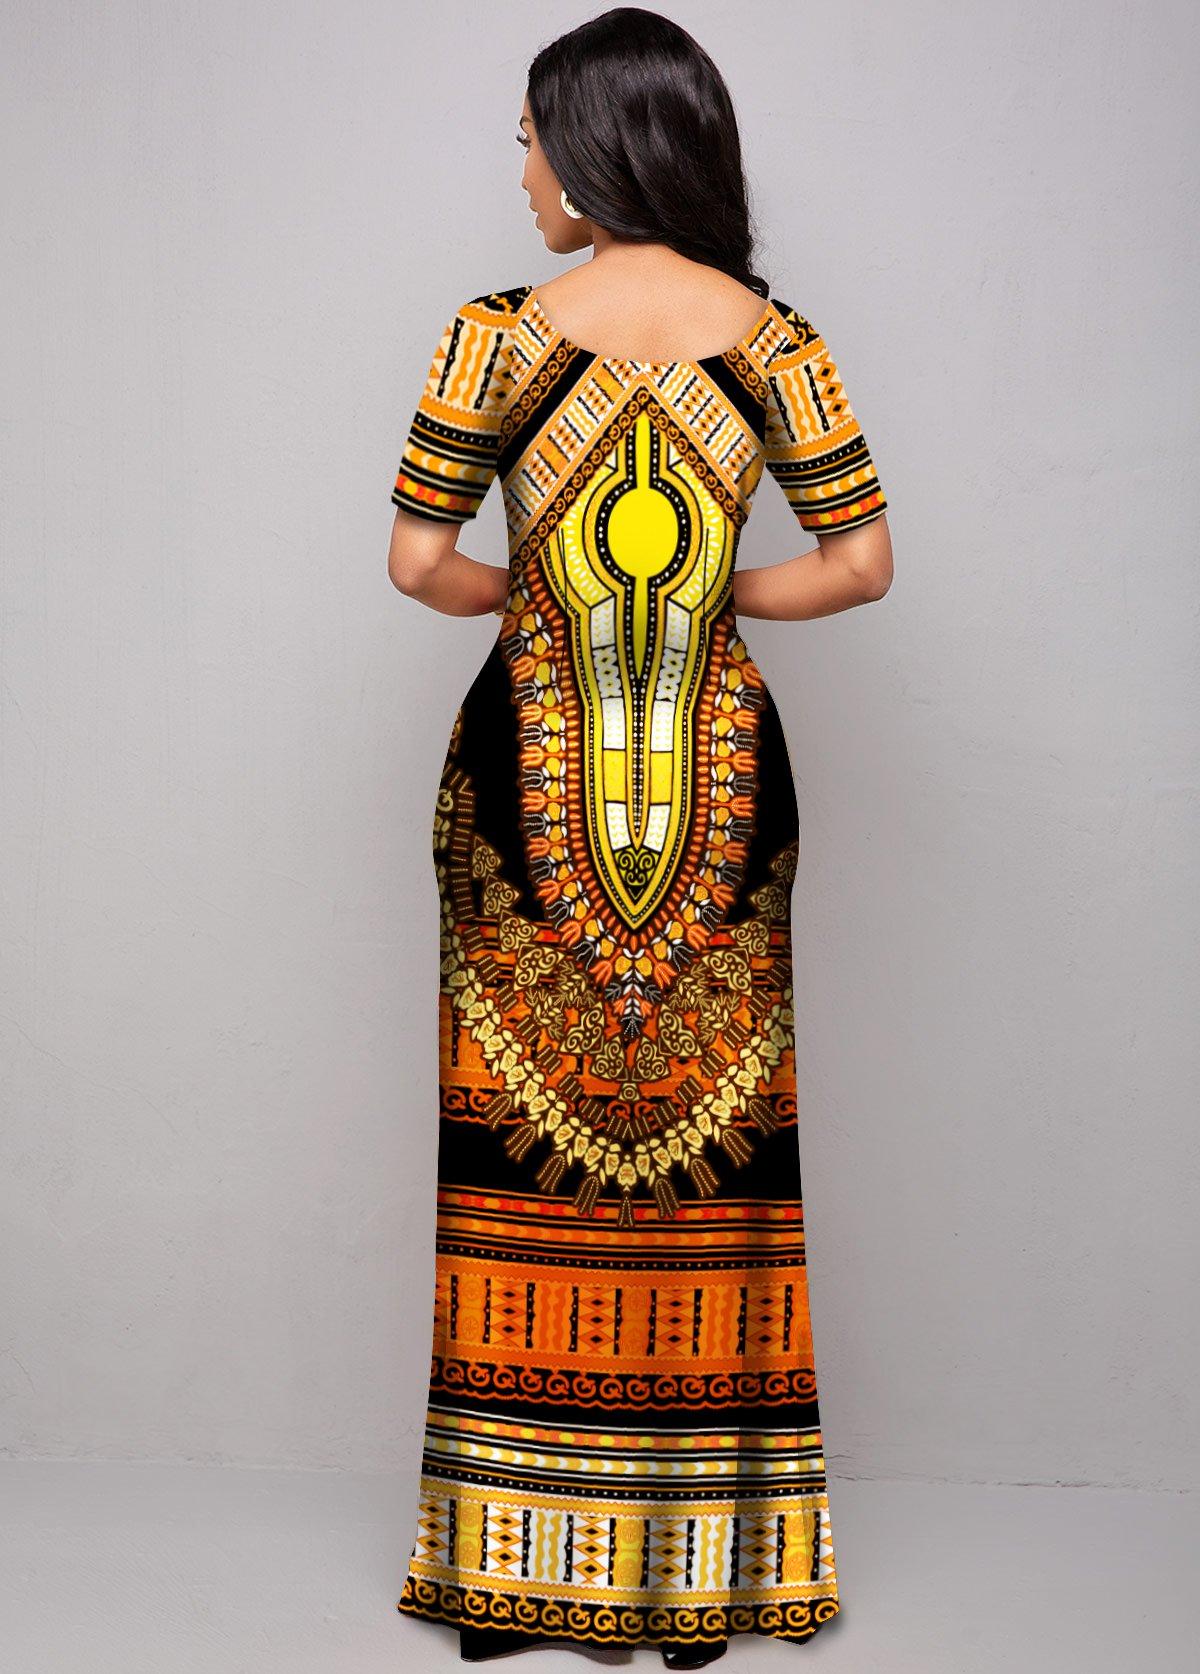 Short Sleeve Tribal Print Round Neck Dress